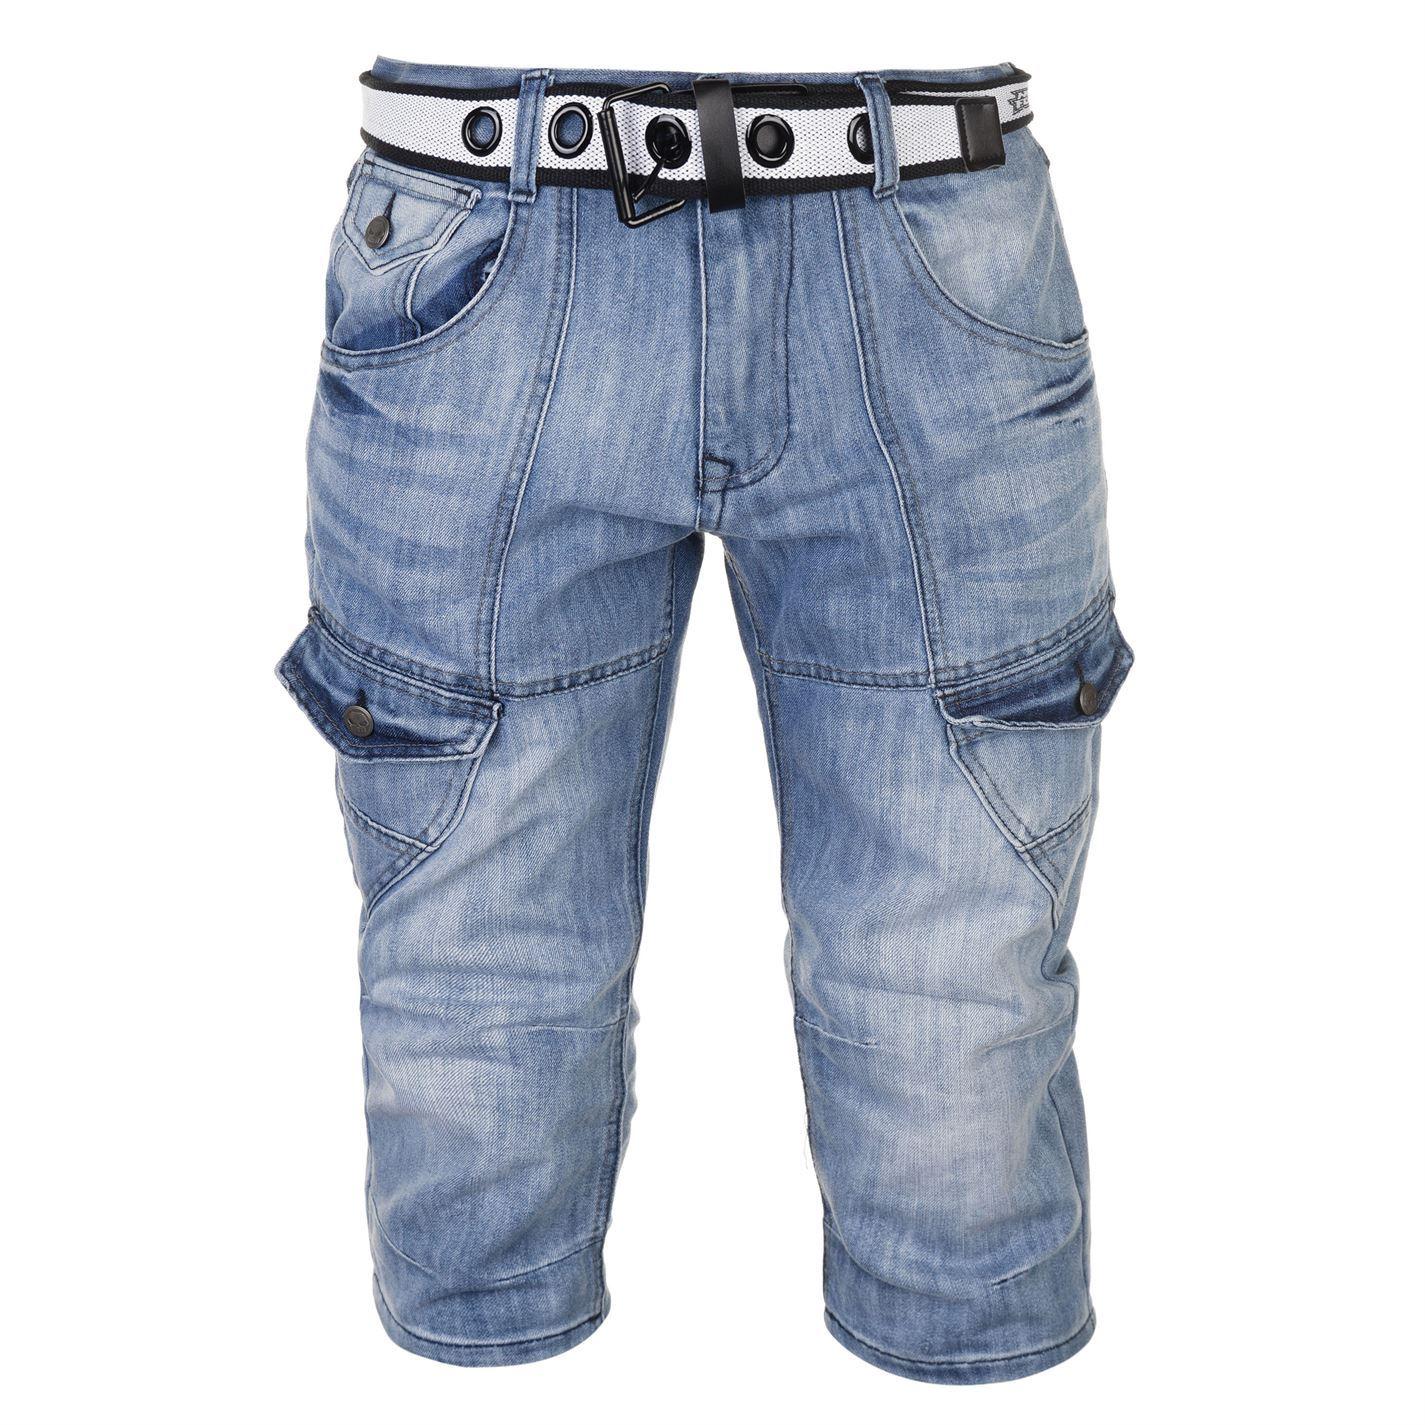 No-Fear-Belted-Cargo-Shorts-Mens-Bottoms-Short-Pants-Summerwear thumbnail 12